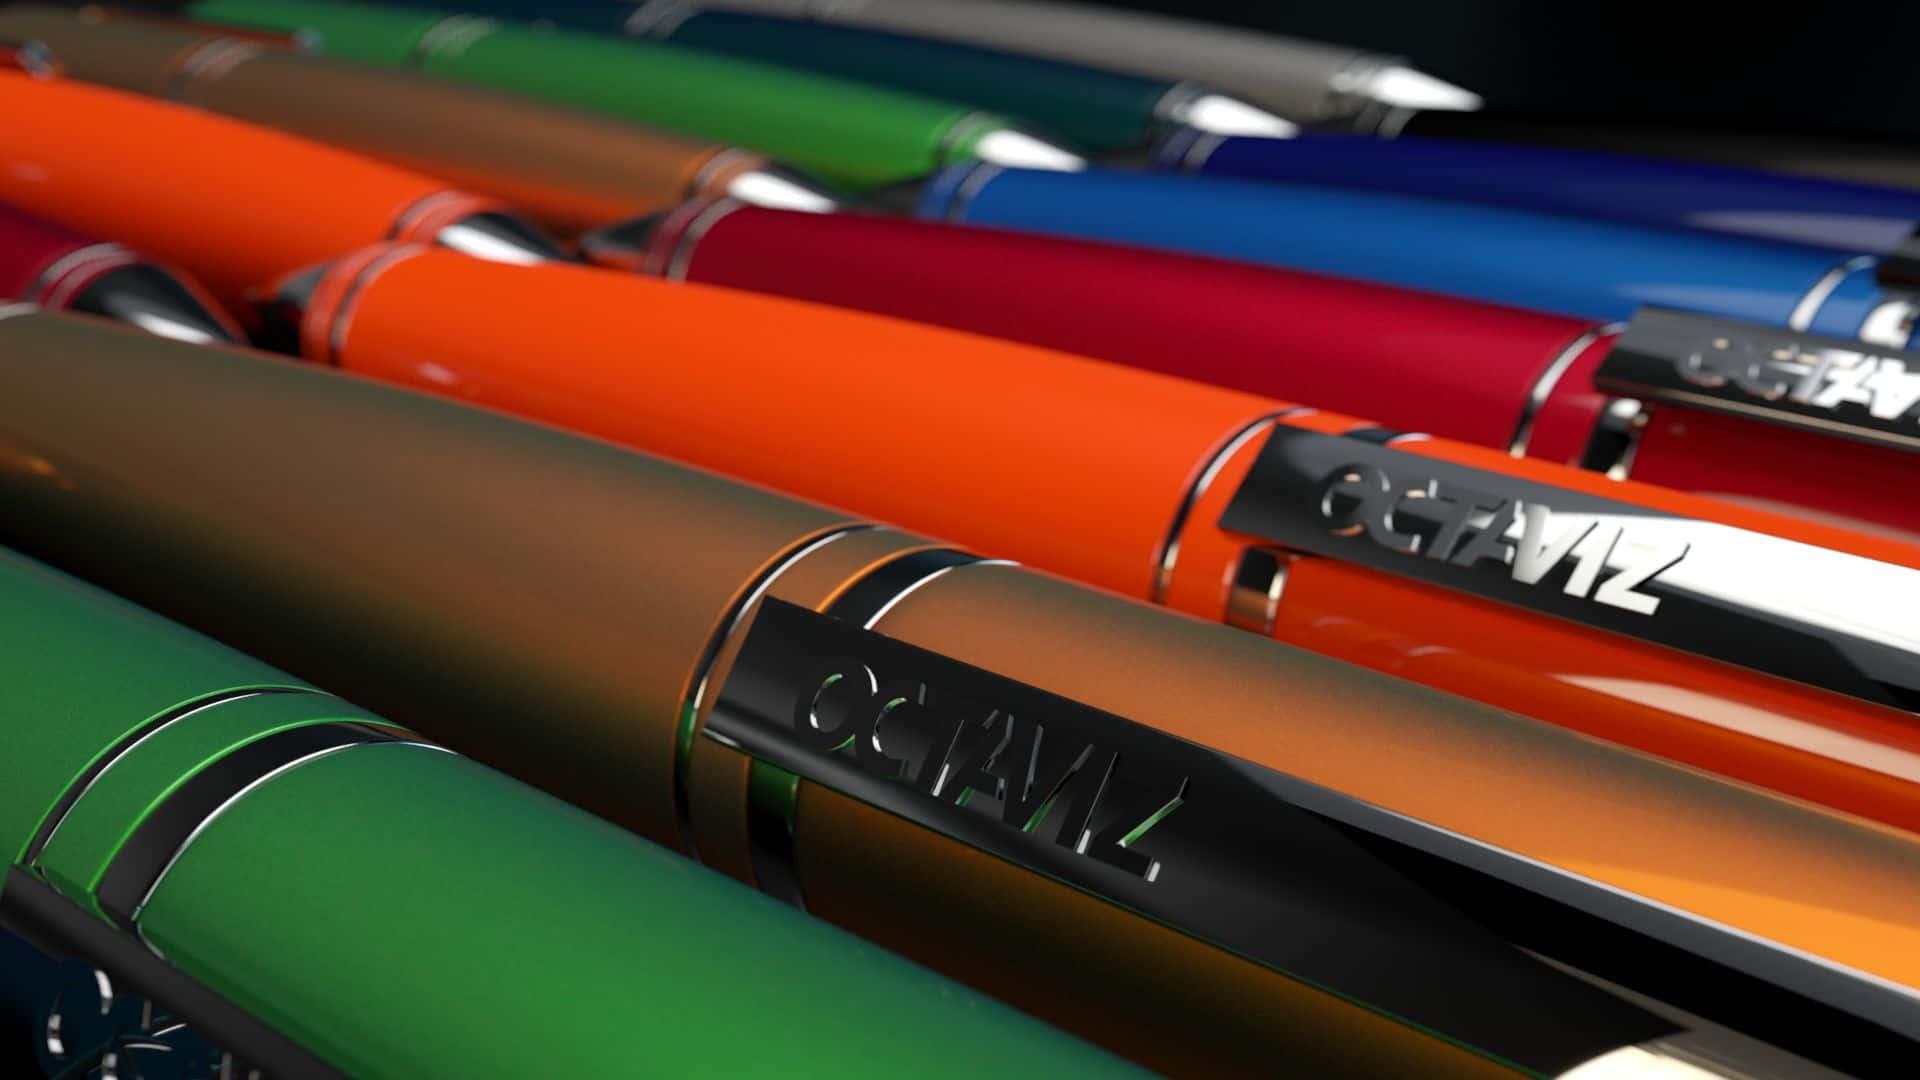 Octaviz Ball Pen Collection